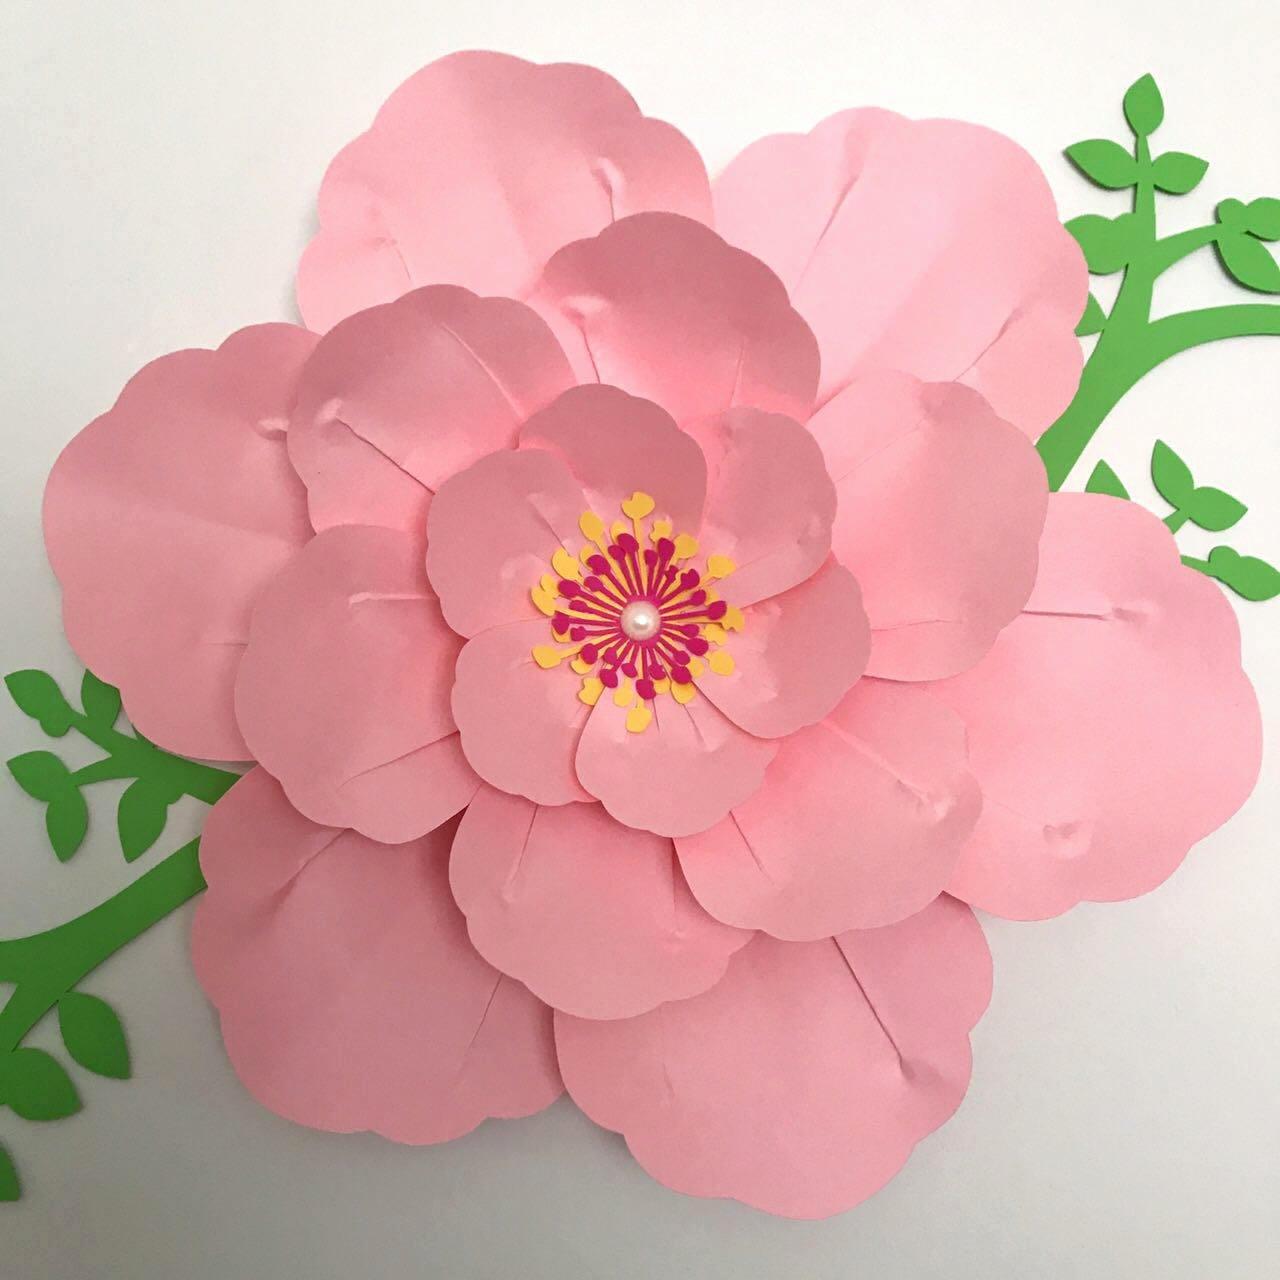 Template for Paper Flowers Luxury Svg Petal 16 Paper Flower Template Digital Version